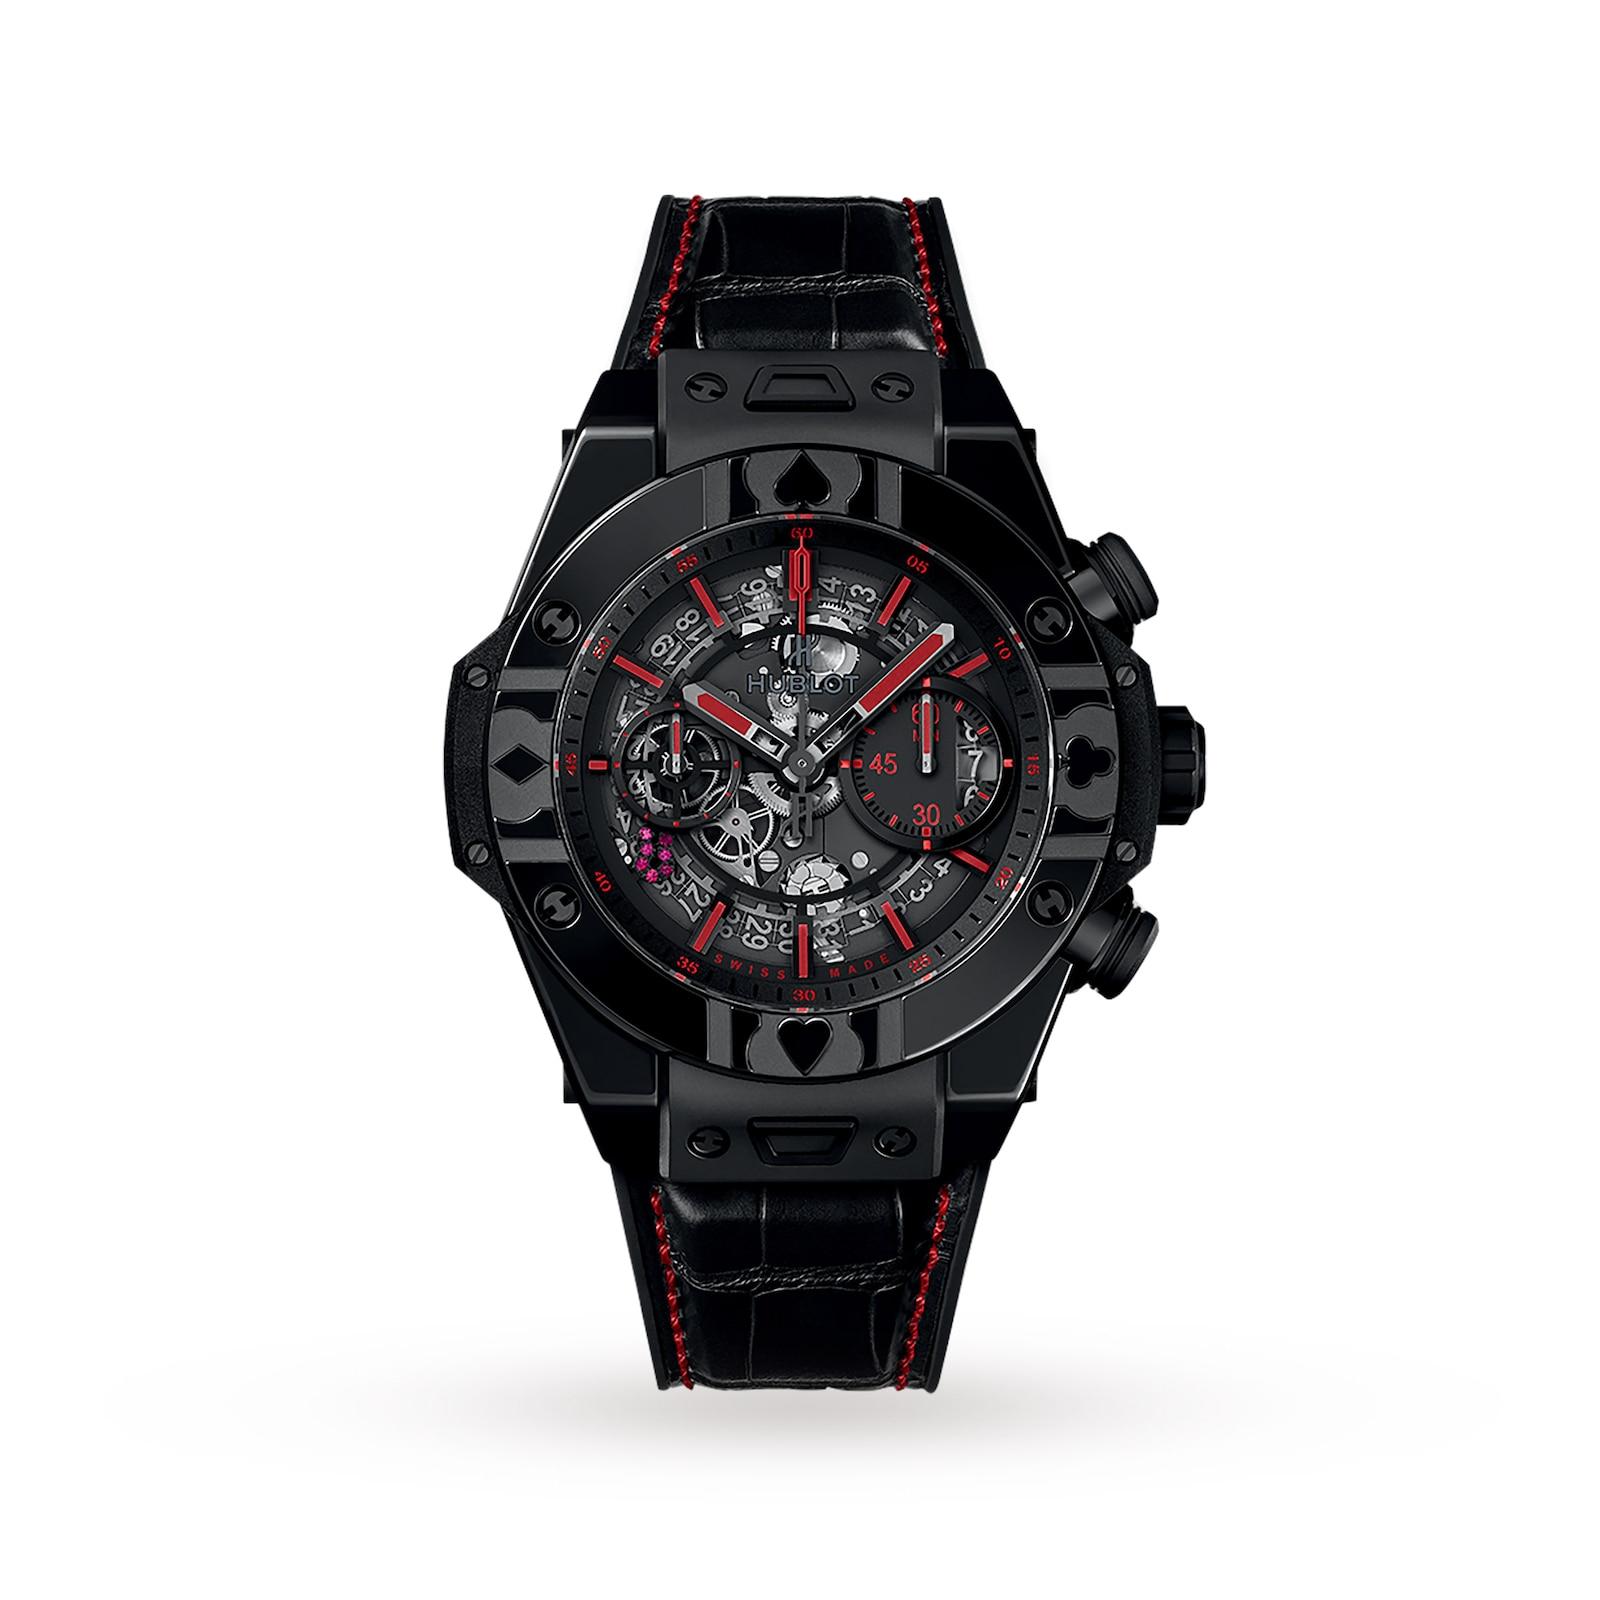 Hublot Hublot Big Bang UNICO World Poker Tour All Black 45mm Mens Watch